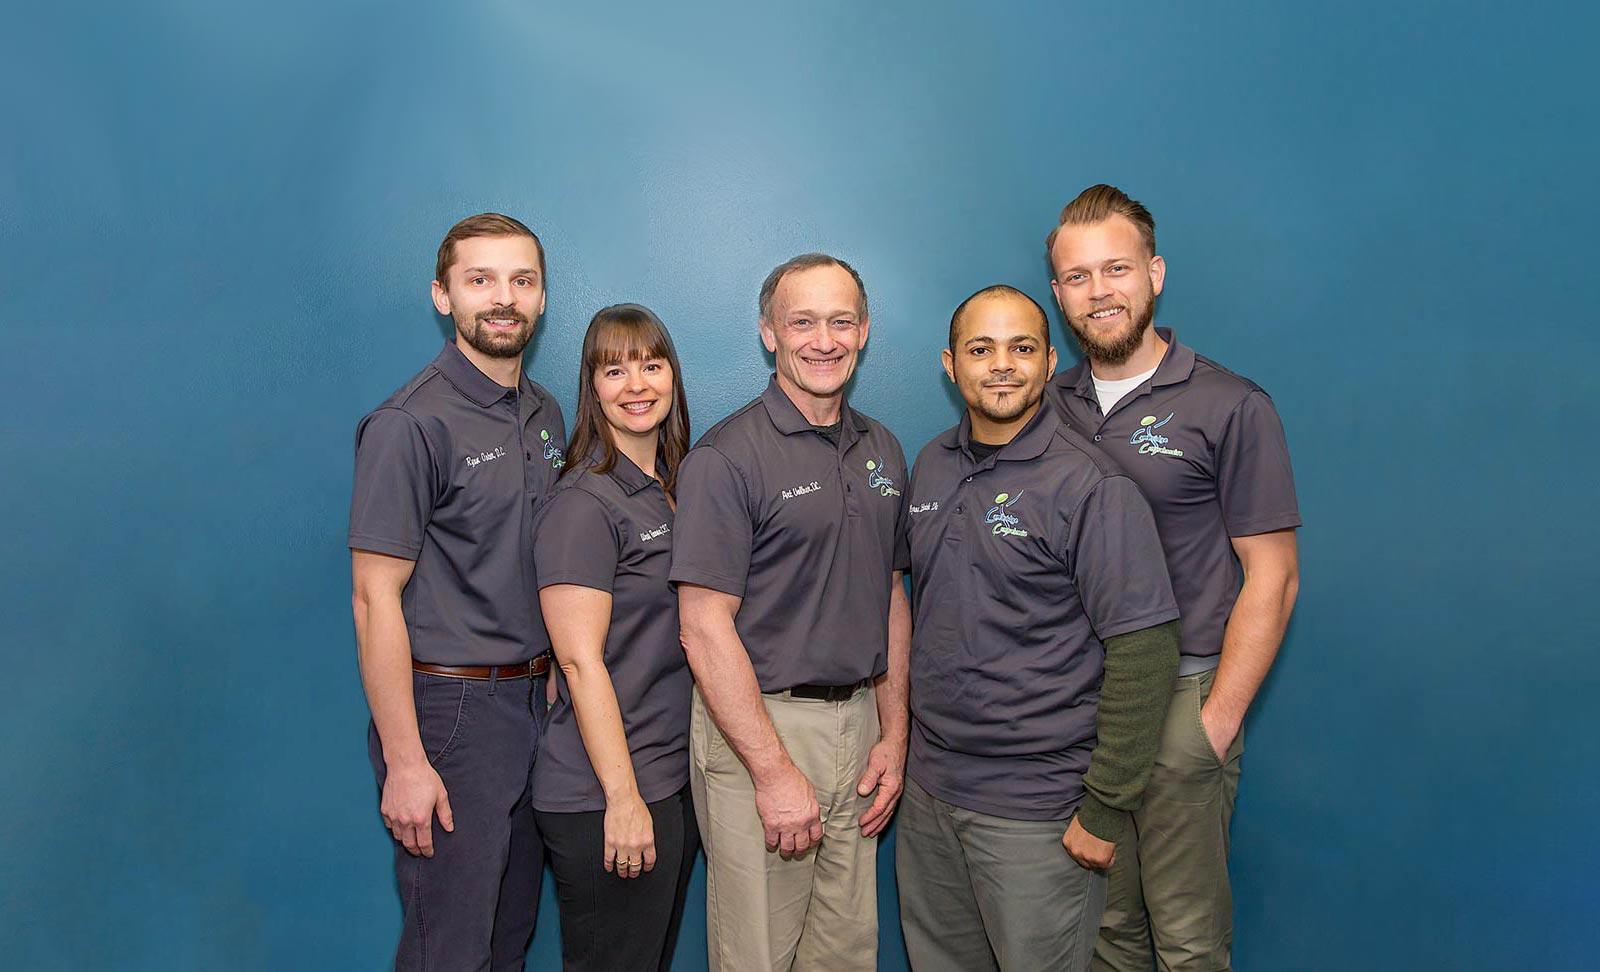 https:Chiropractor Cambridge MN Ryan Oster Arthur Volker Kyle Volker and Staff//www.comprehensivehealthclinics.com/